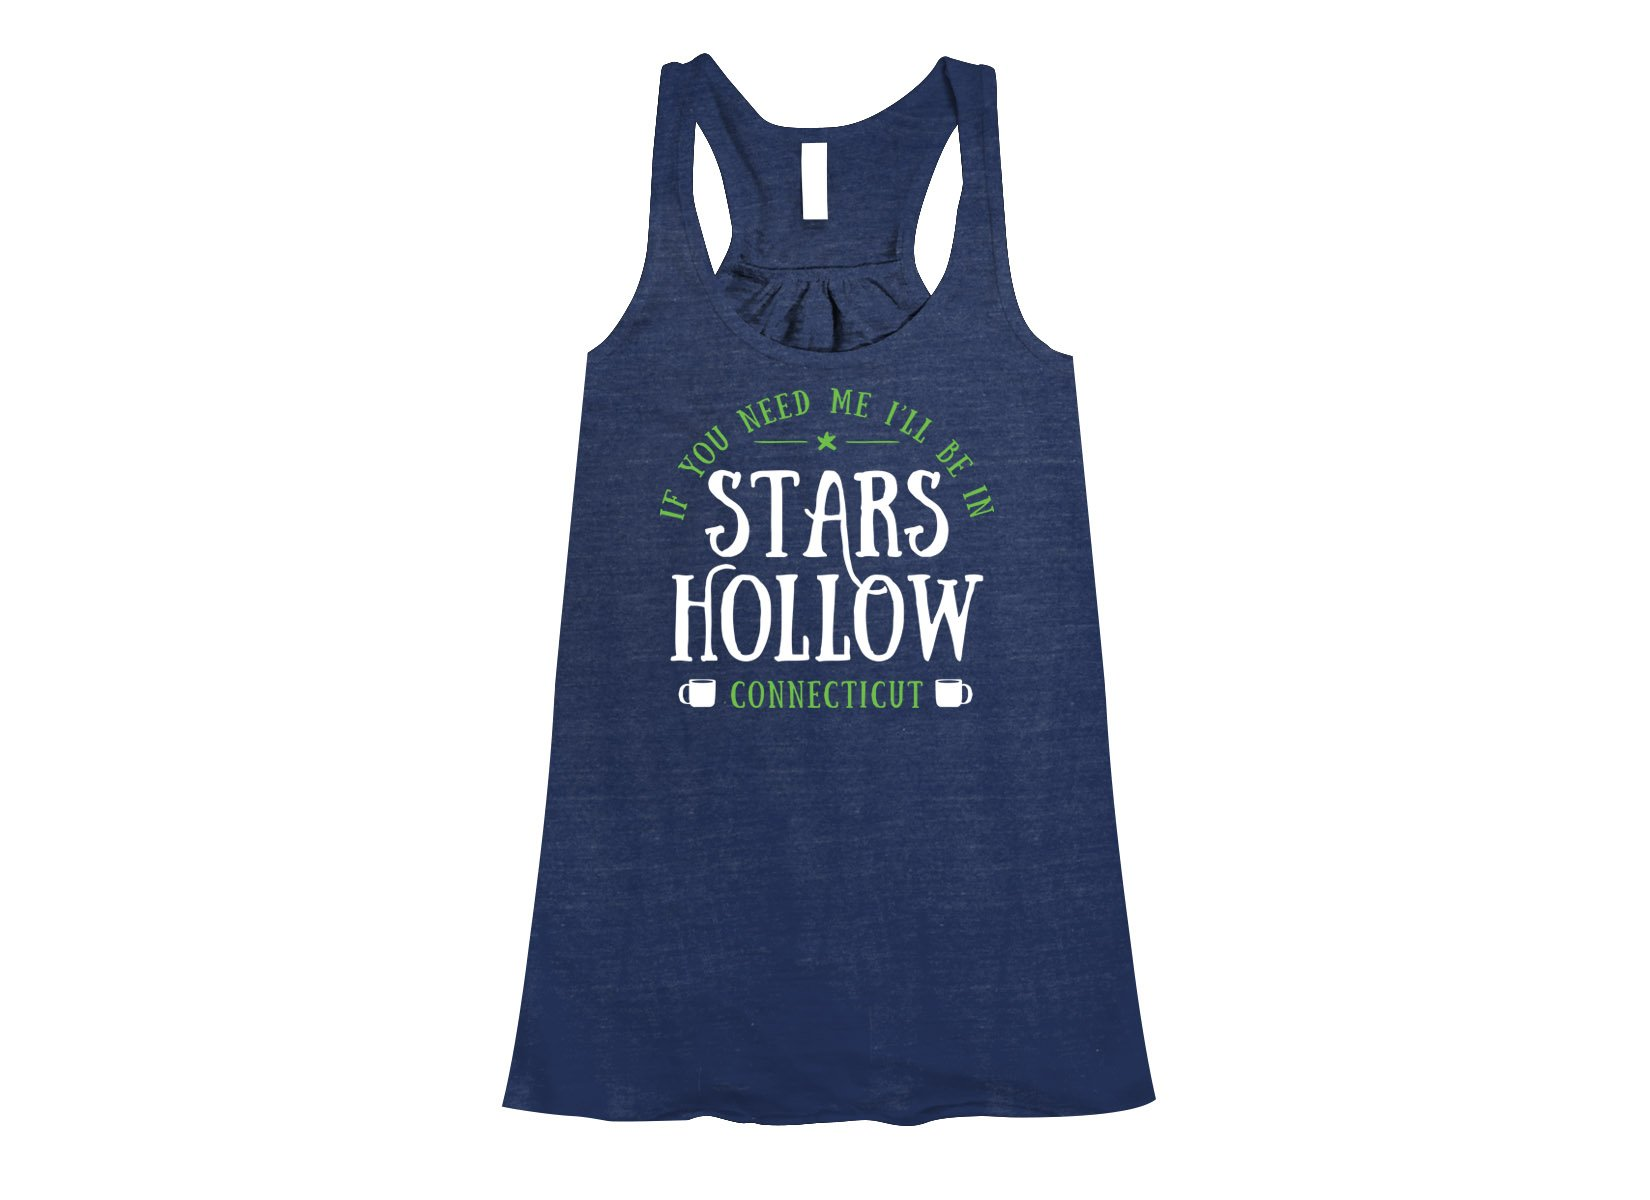 Stars Hollow on Womens Tanks T-Shirt